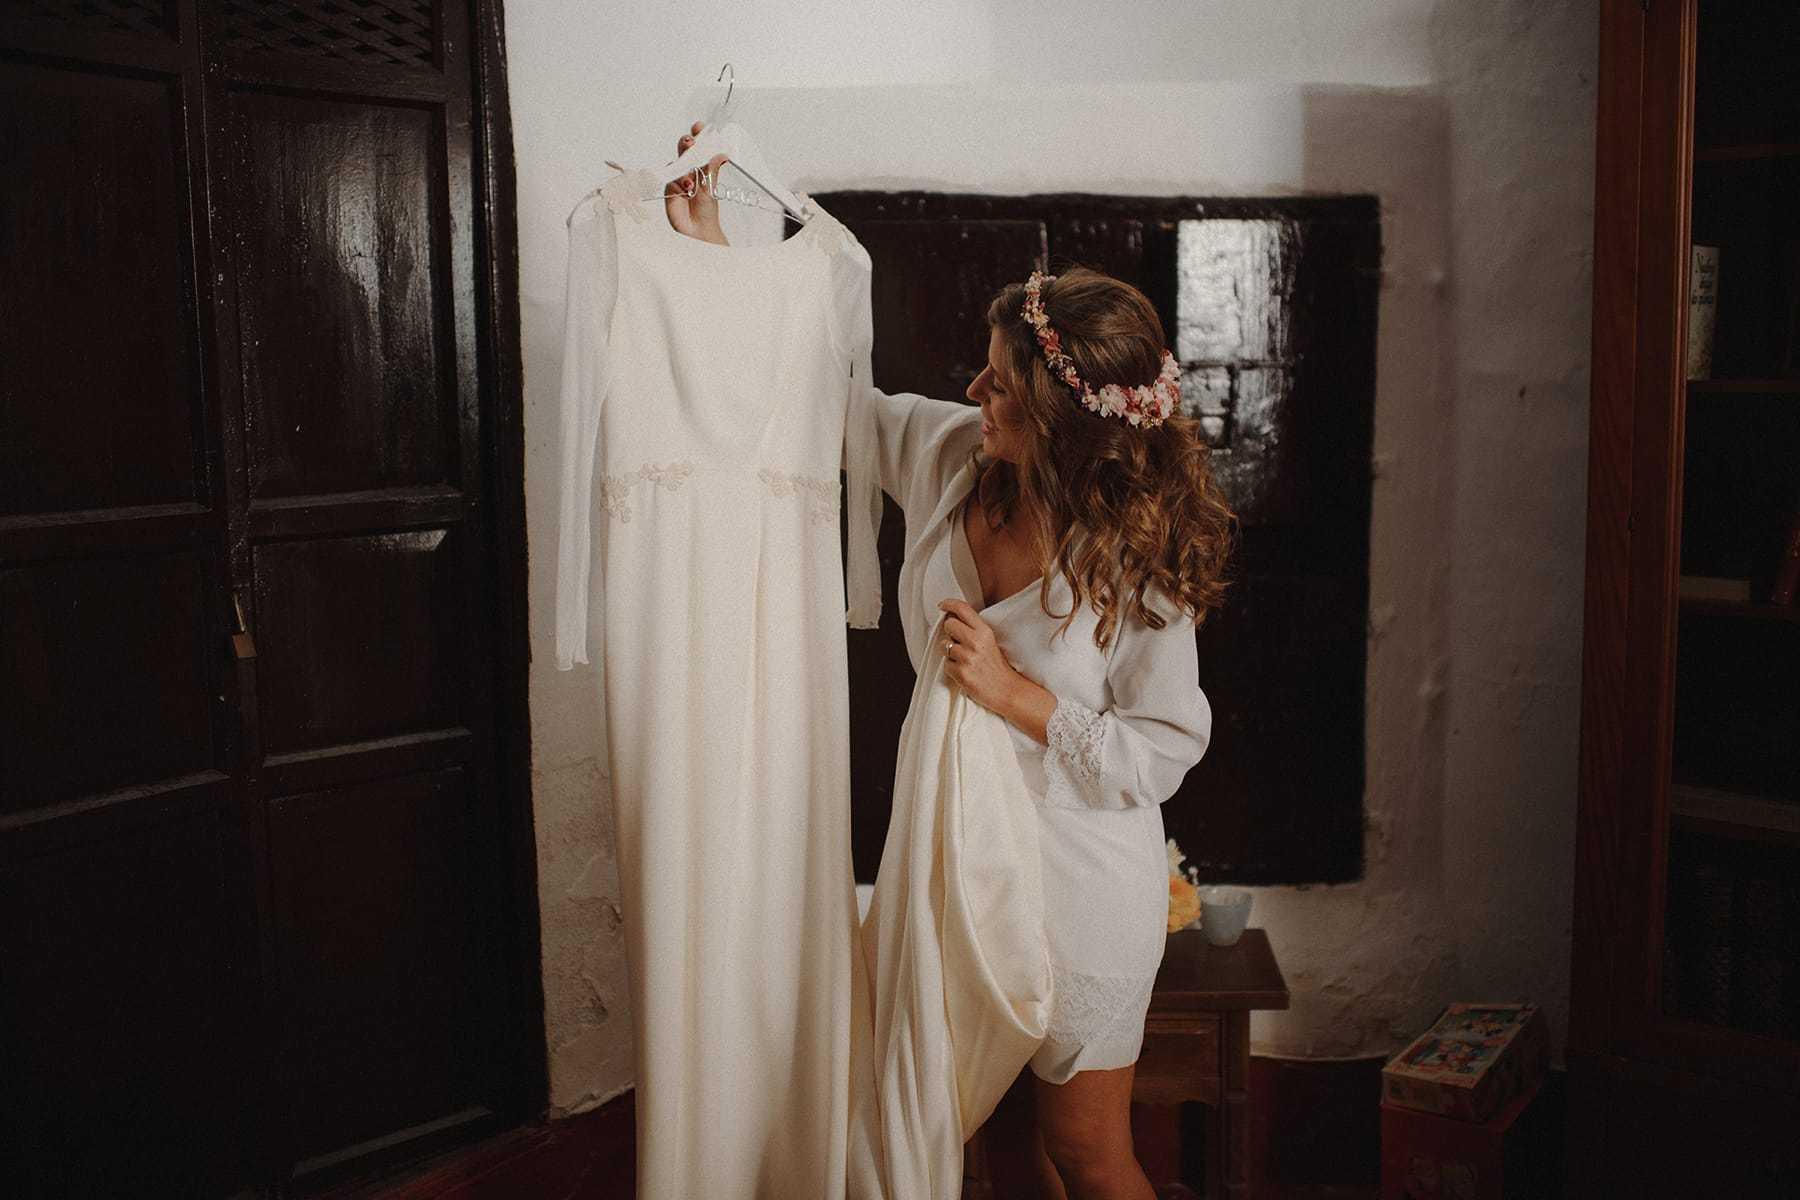 Vestido de Novia de Paredero Quirós